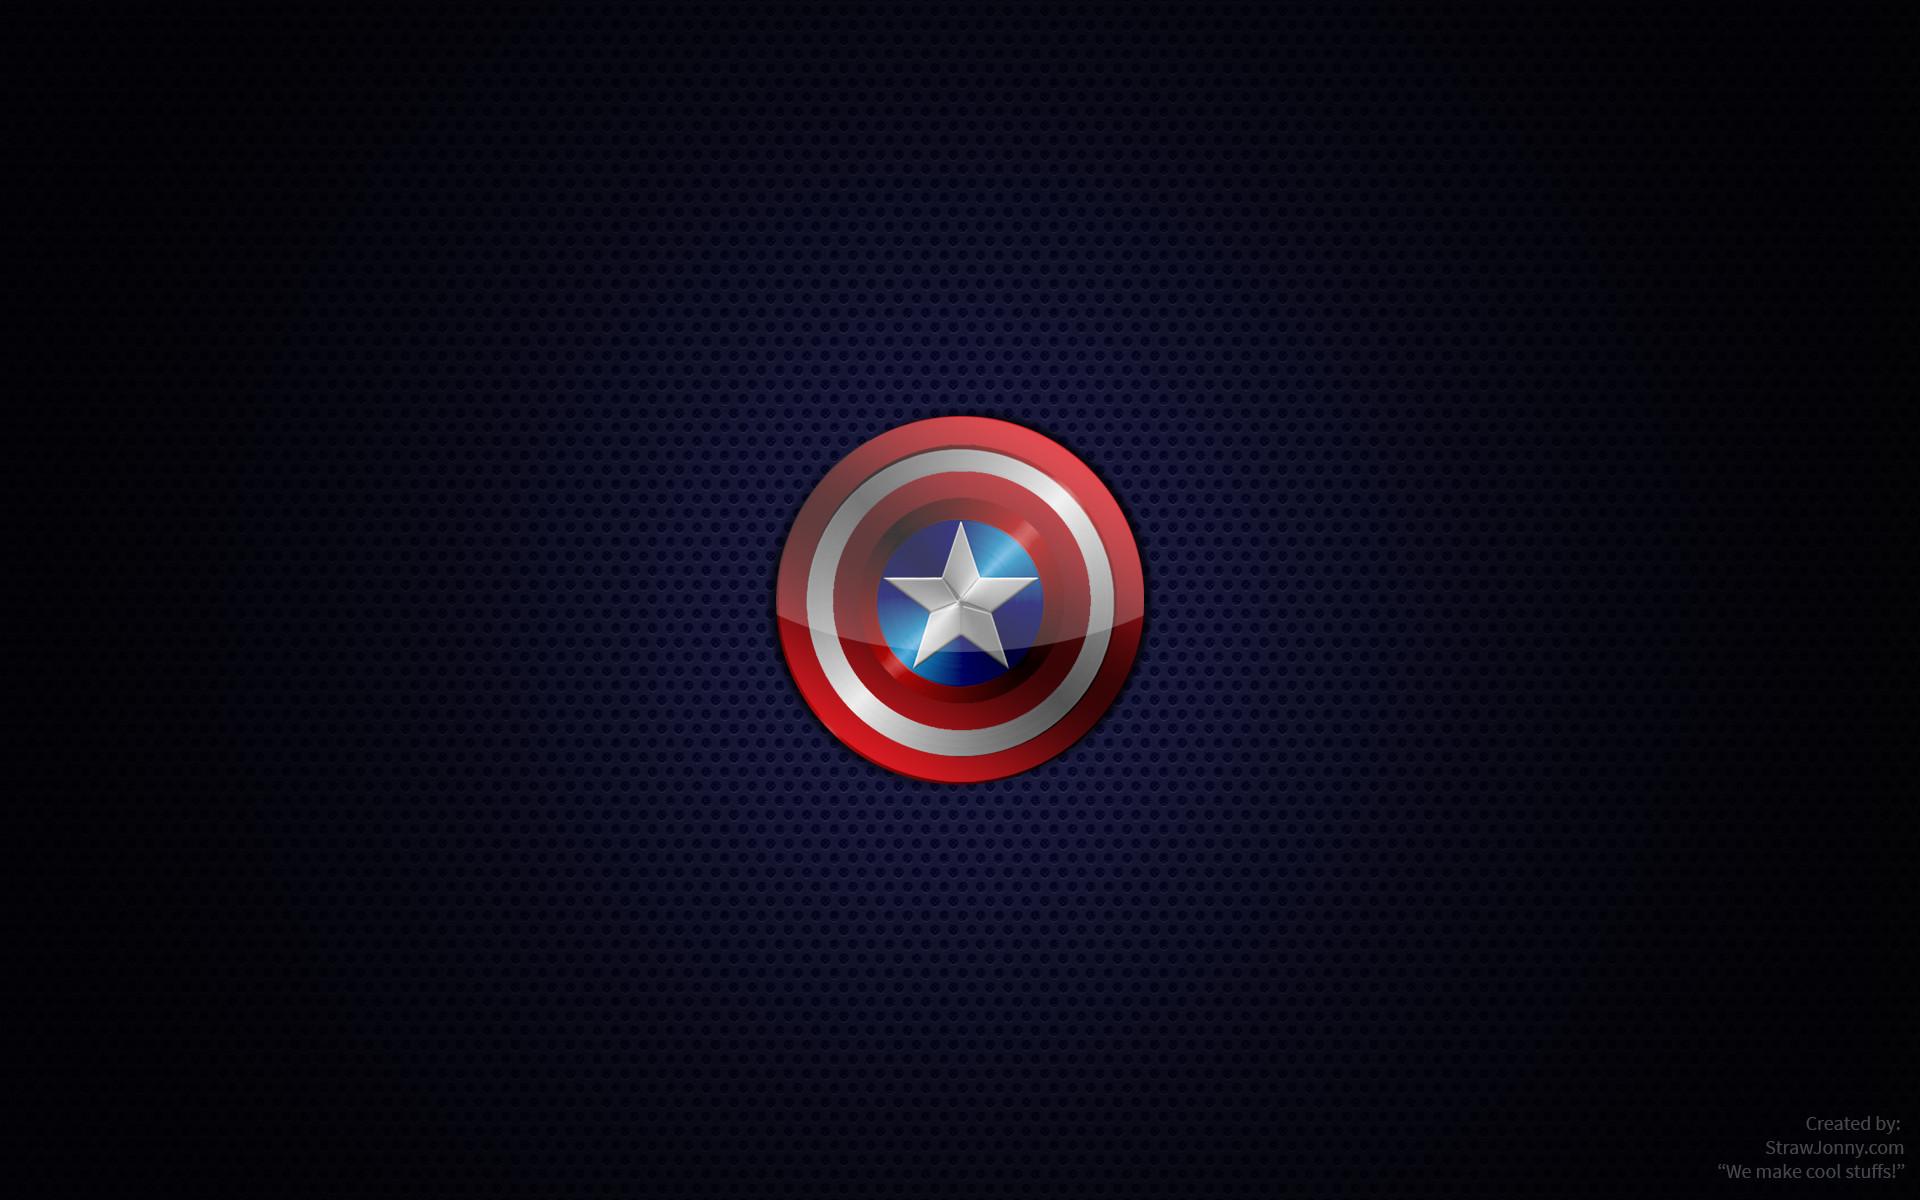 Captain America Wallpapers Best Wallpapers   HD Wallpapers   Pinterest    Captain america wallpaper and Wallpaper